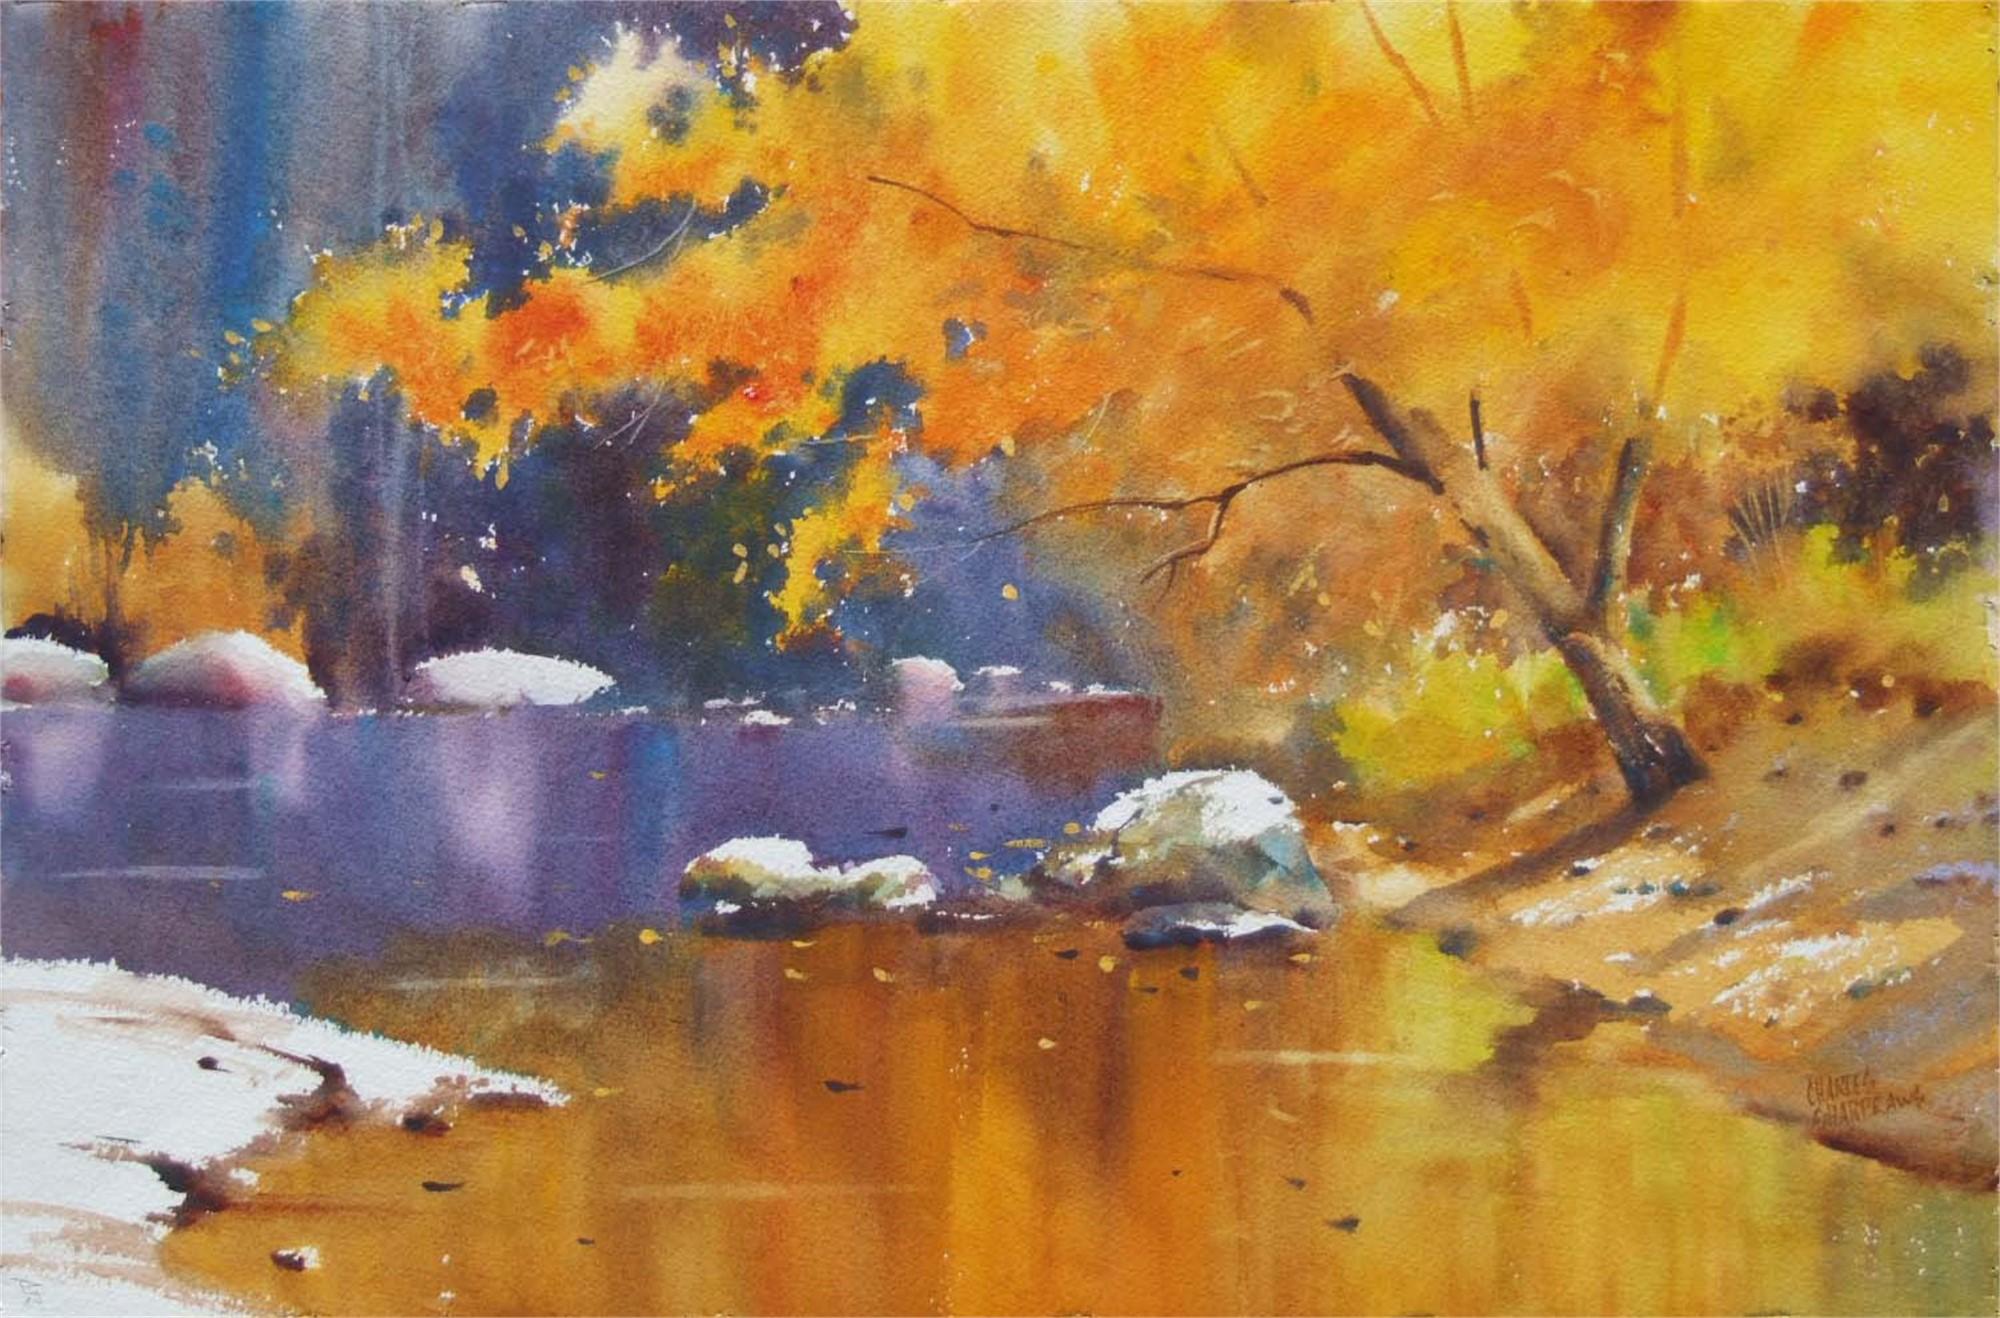 Eno Autumn by Charles Sharpe